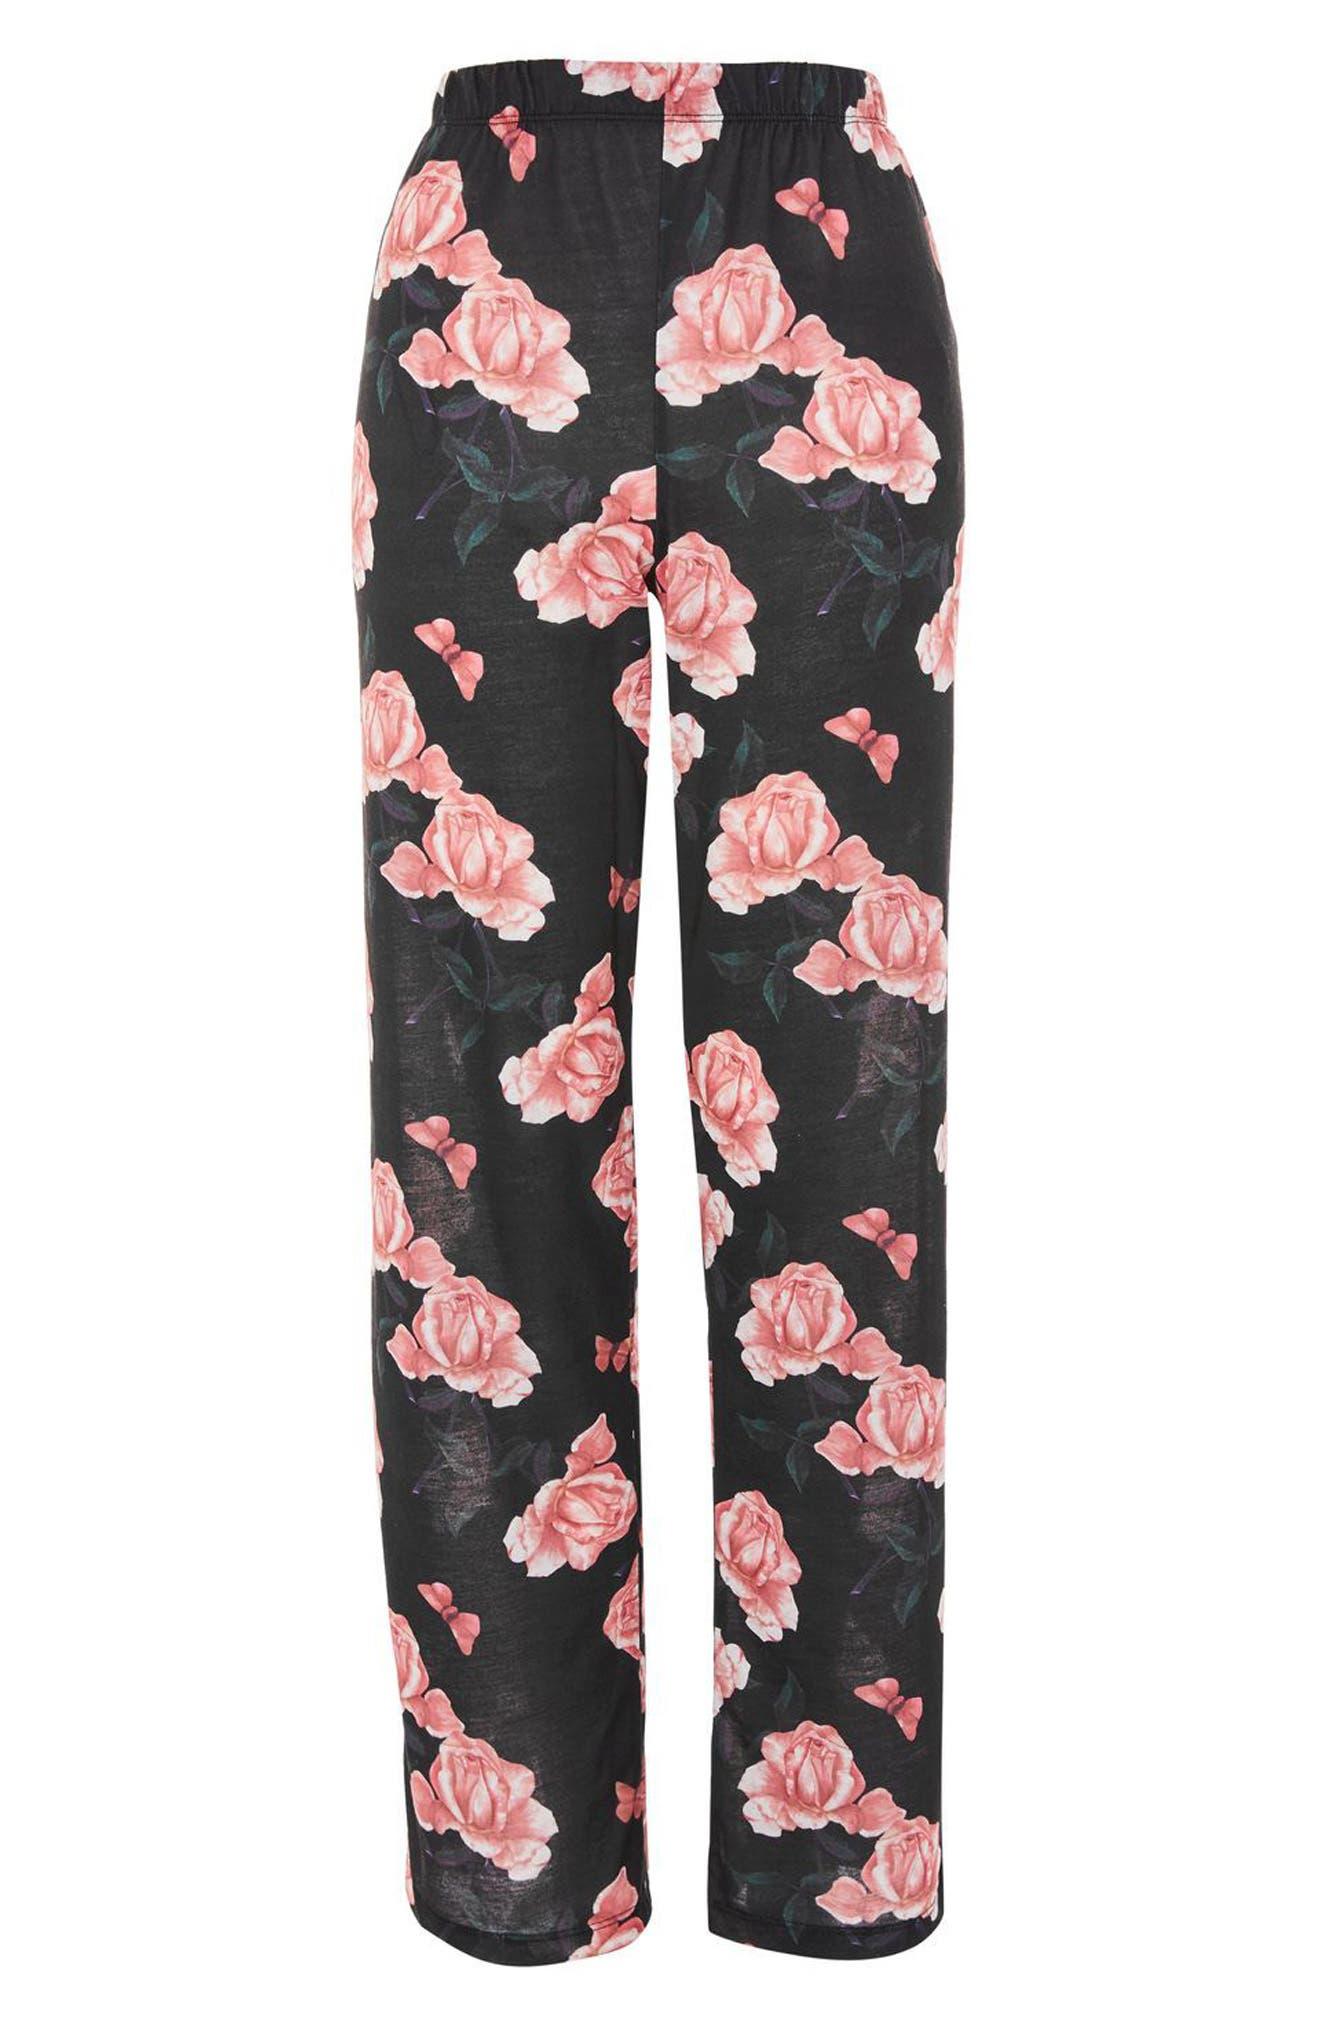 Rose Pajama Pants,                             Alternate thumbnail 3, color,                             Black Multi